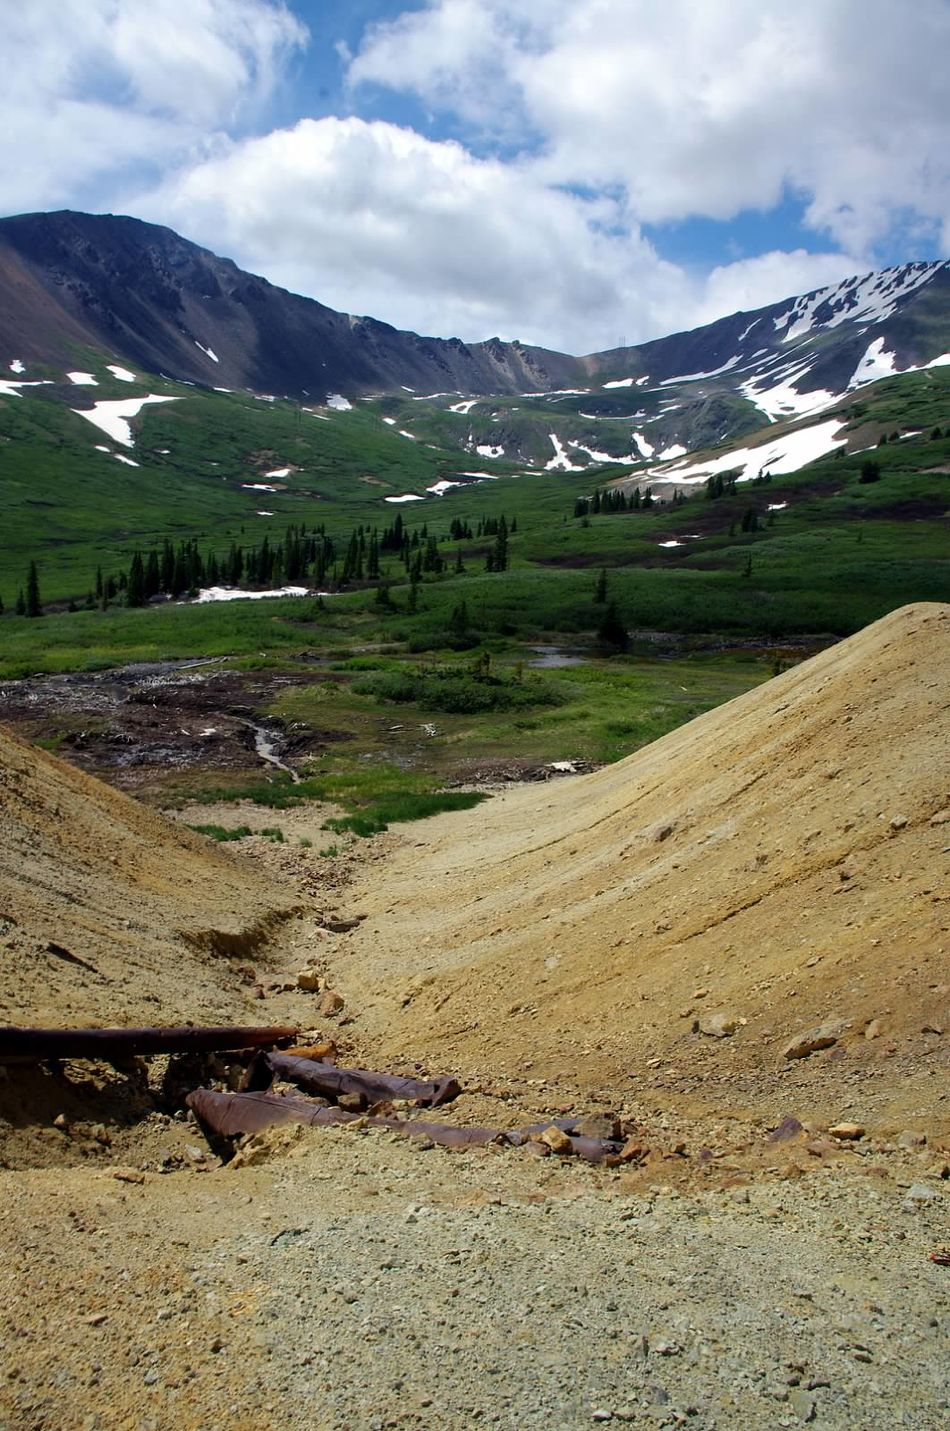 Mountain Landscape Snow Colorado Colorado Photography Mining History Of America Mining Heritage Argentine Pass Santiago Mine